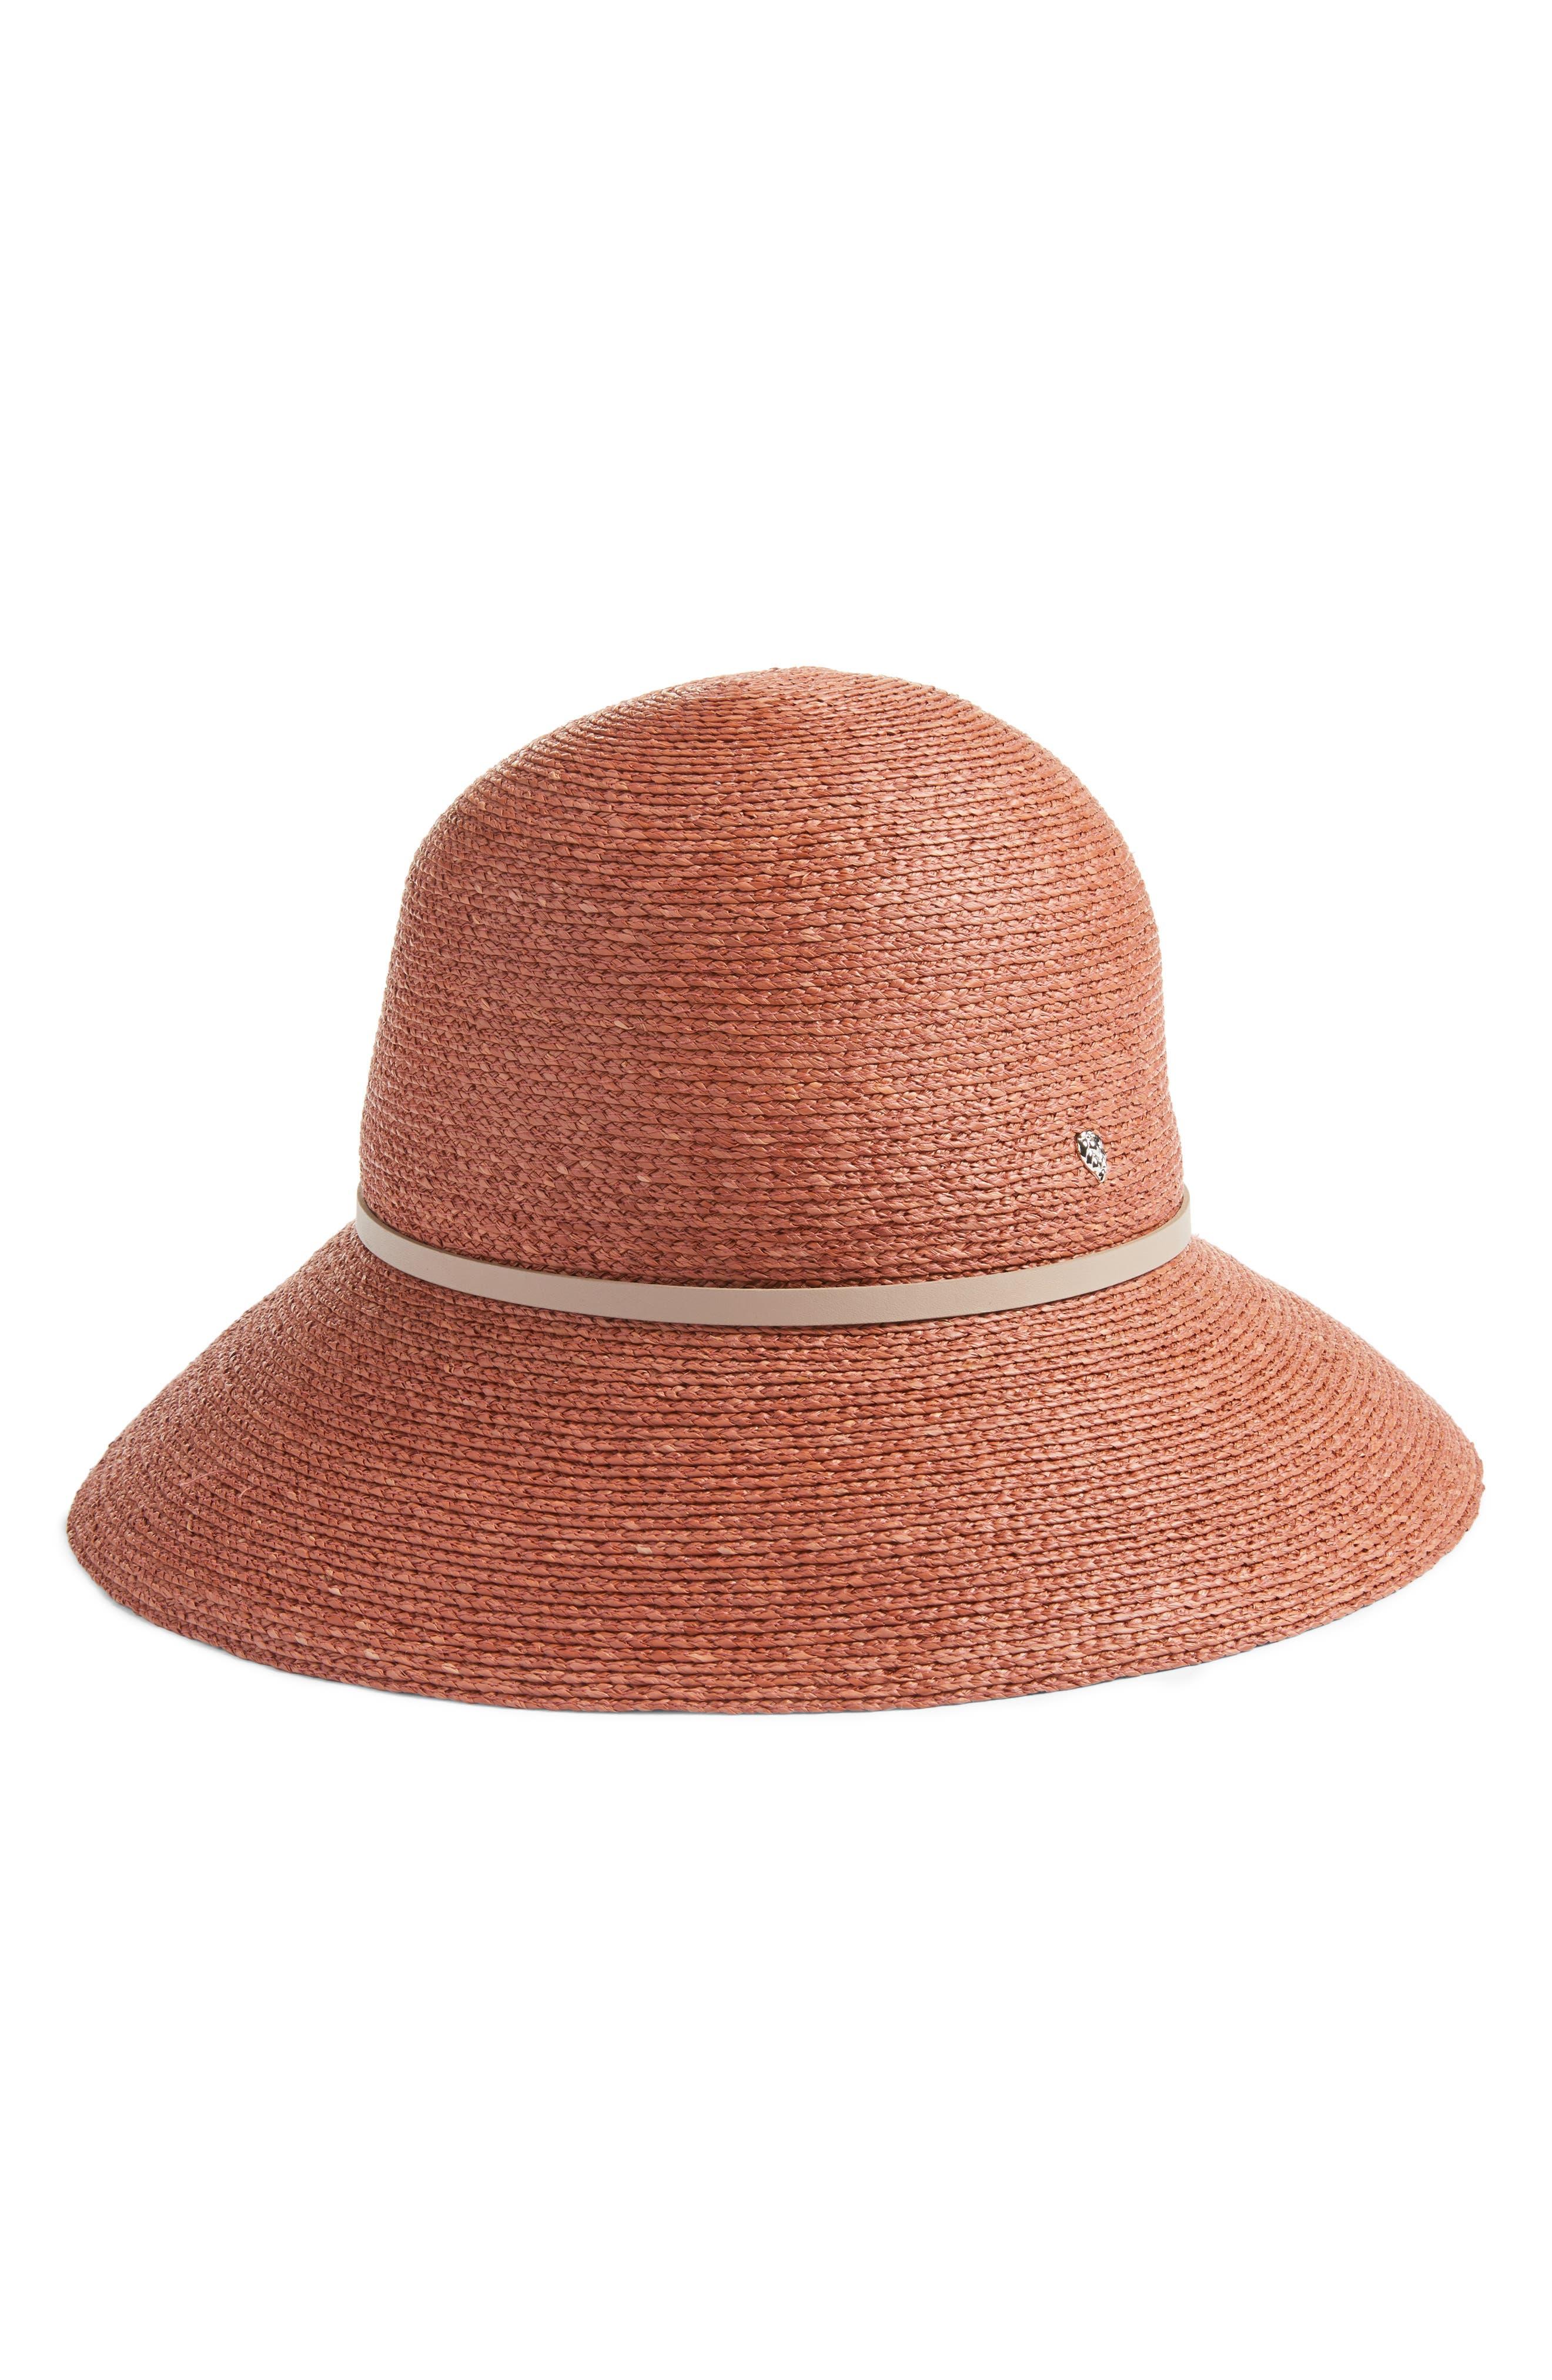 Alternate Image 2  - Helen Kaminski Packable Raffia Cloche Hat